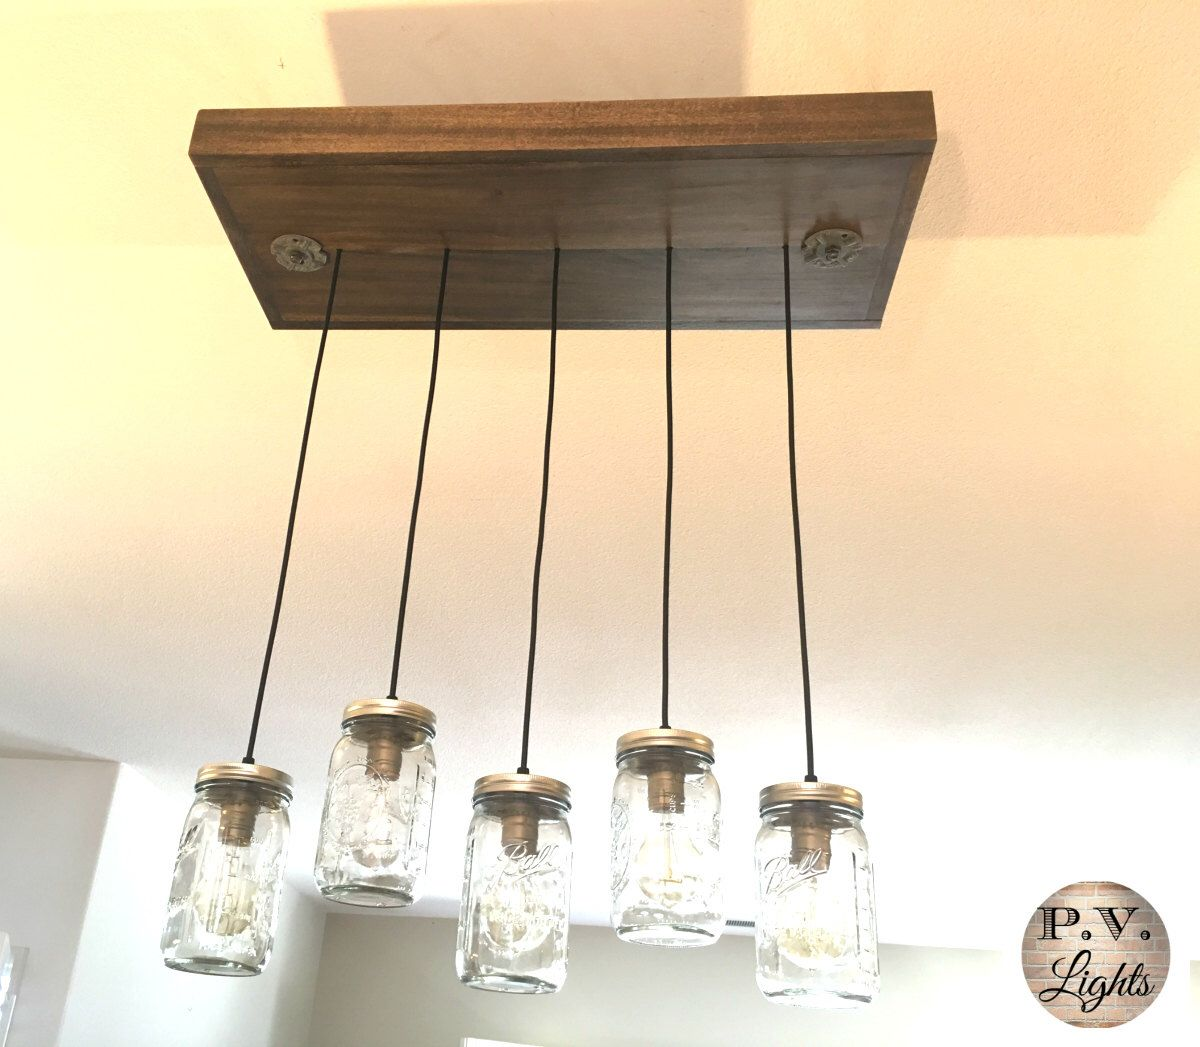 Vintage industrial pendant lamp mason jar light fixture wood light vintage industrial pendant lamp mason jar light fixture wood light fixture 5 pendants arubaitofo Images